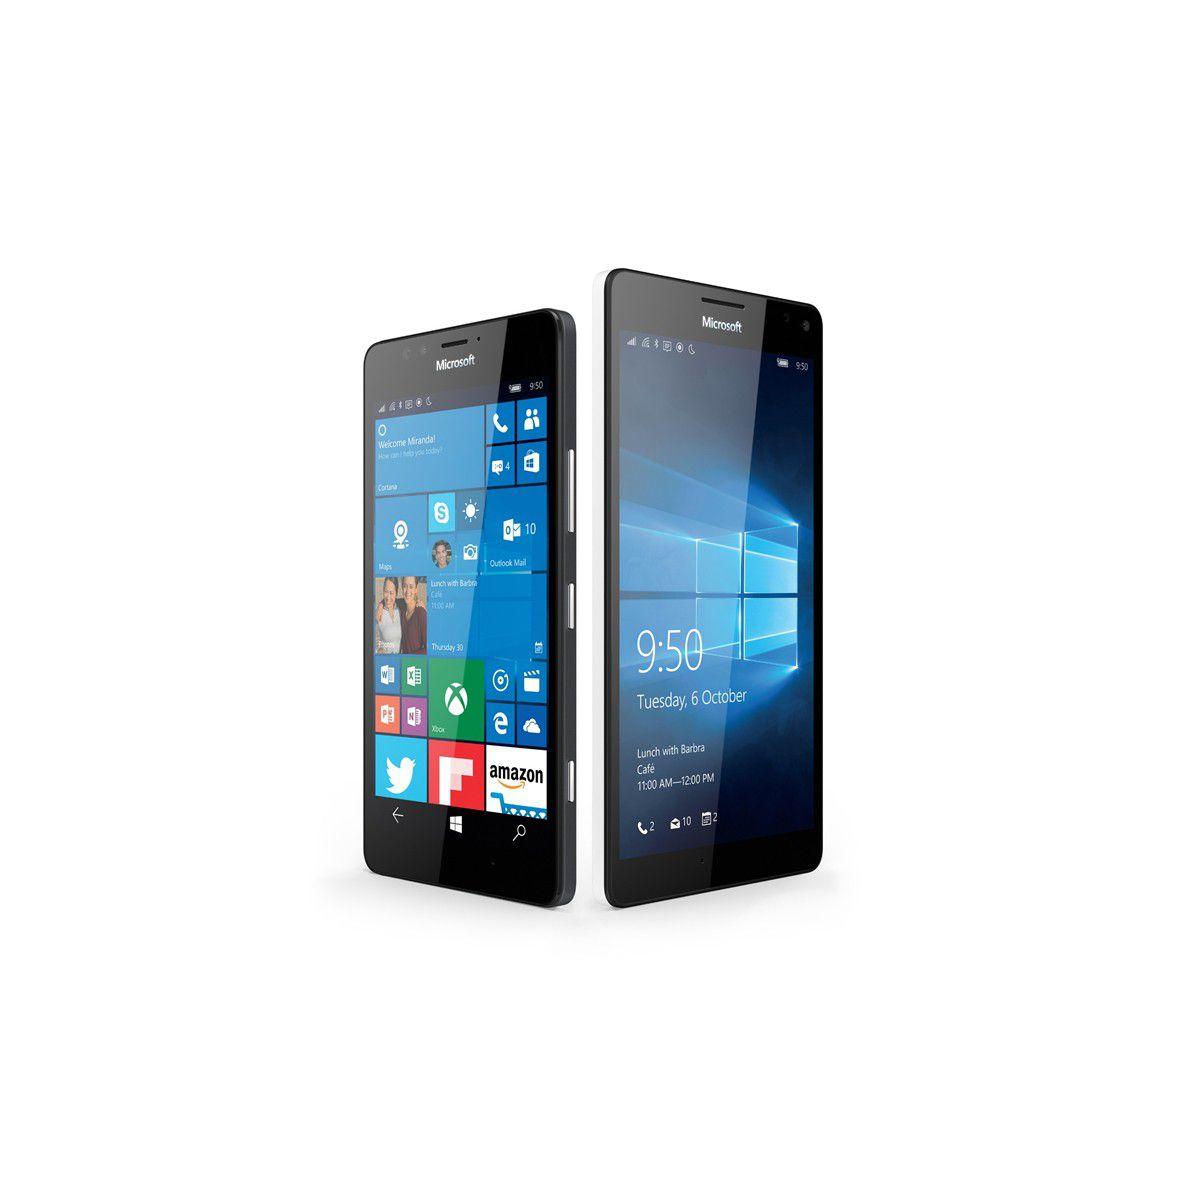 Lumia 950 Und Lumia 950 Xl Erste Smartphones Mit Windows 10 Mobile